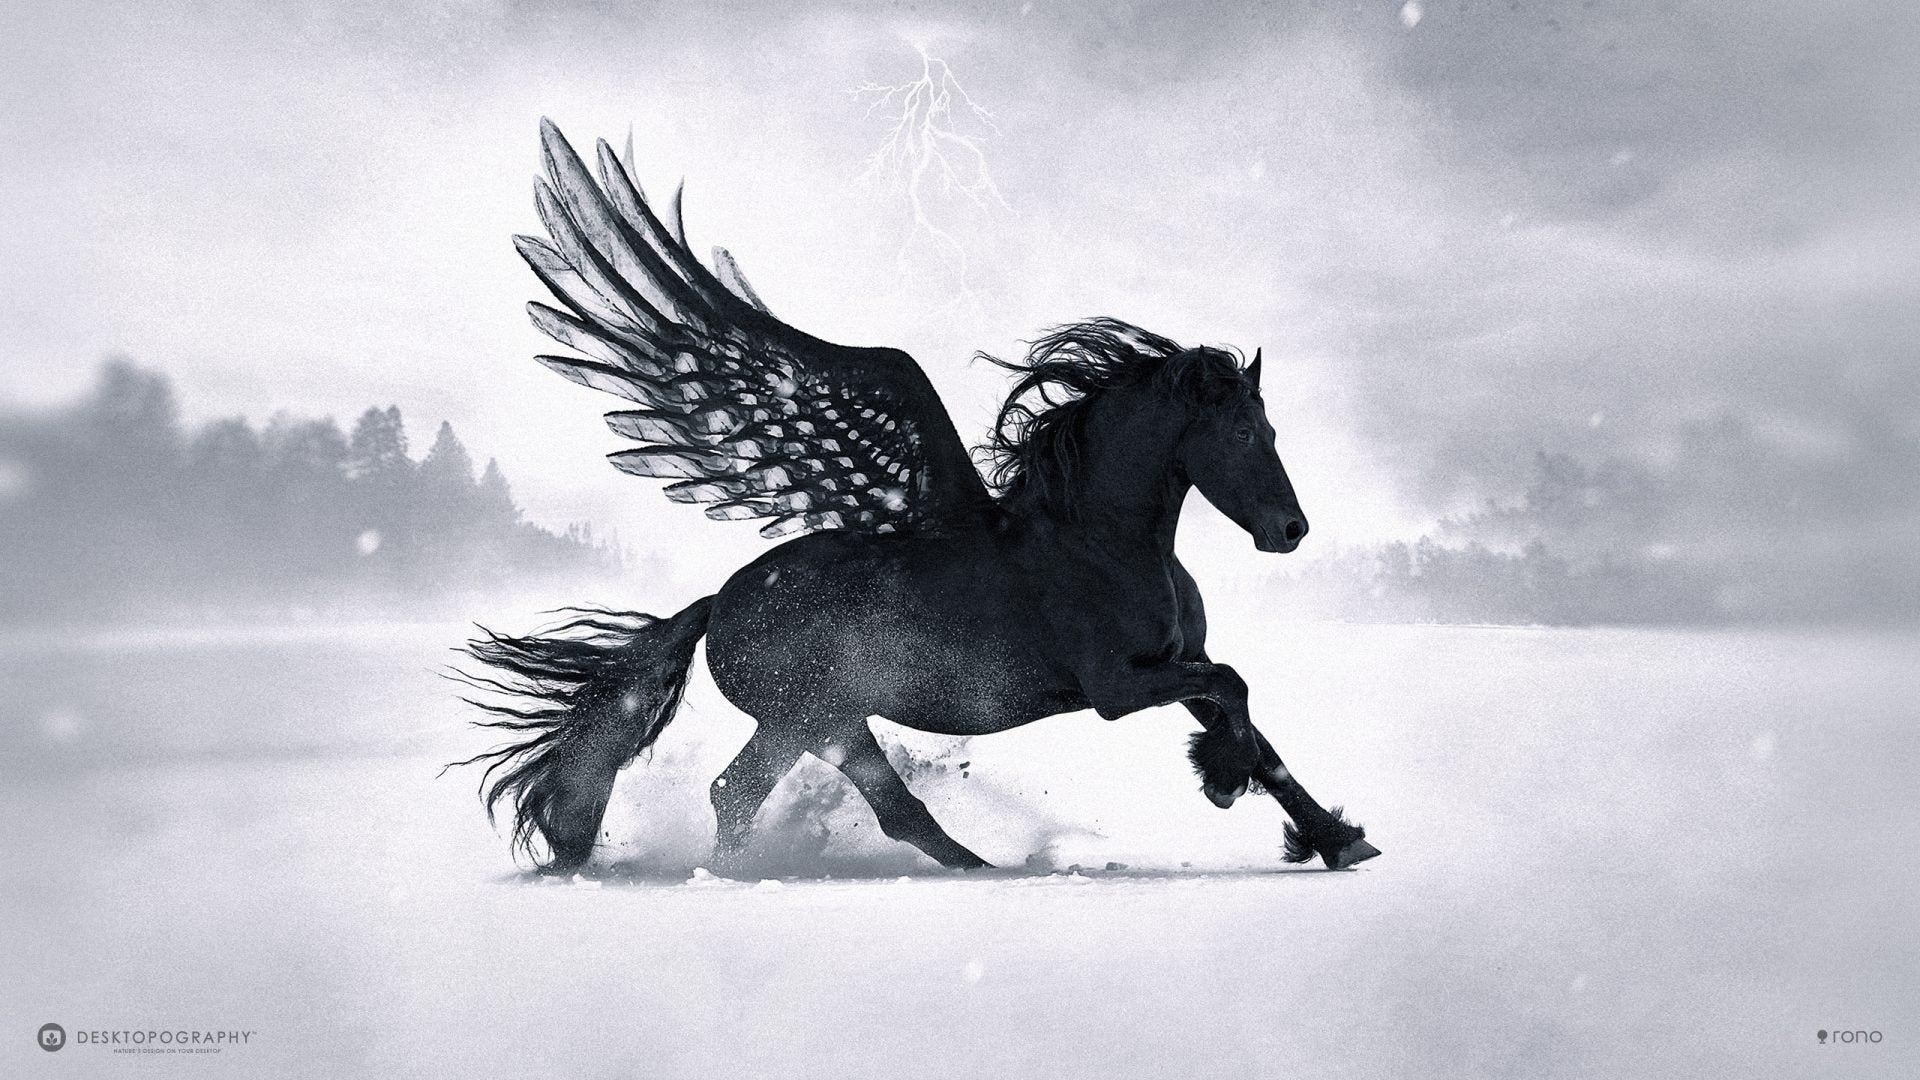 Black Horse best wallpaper